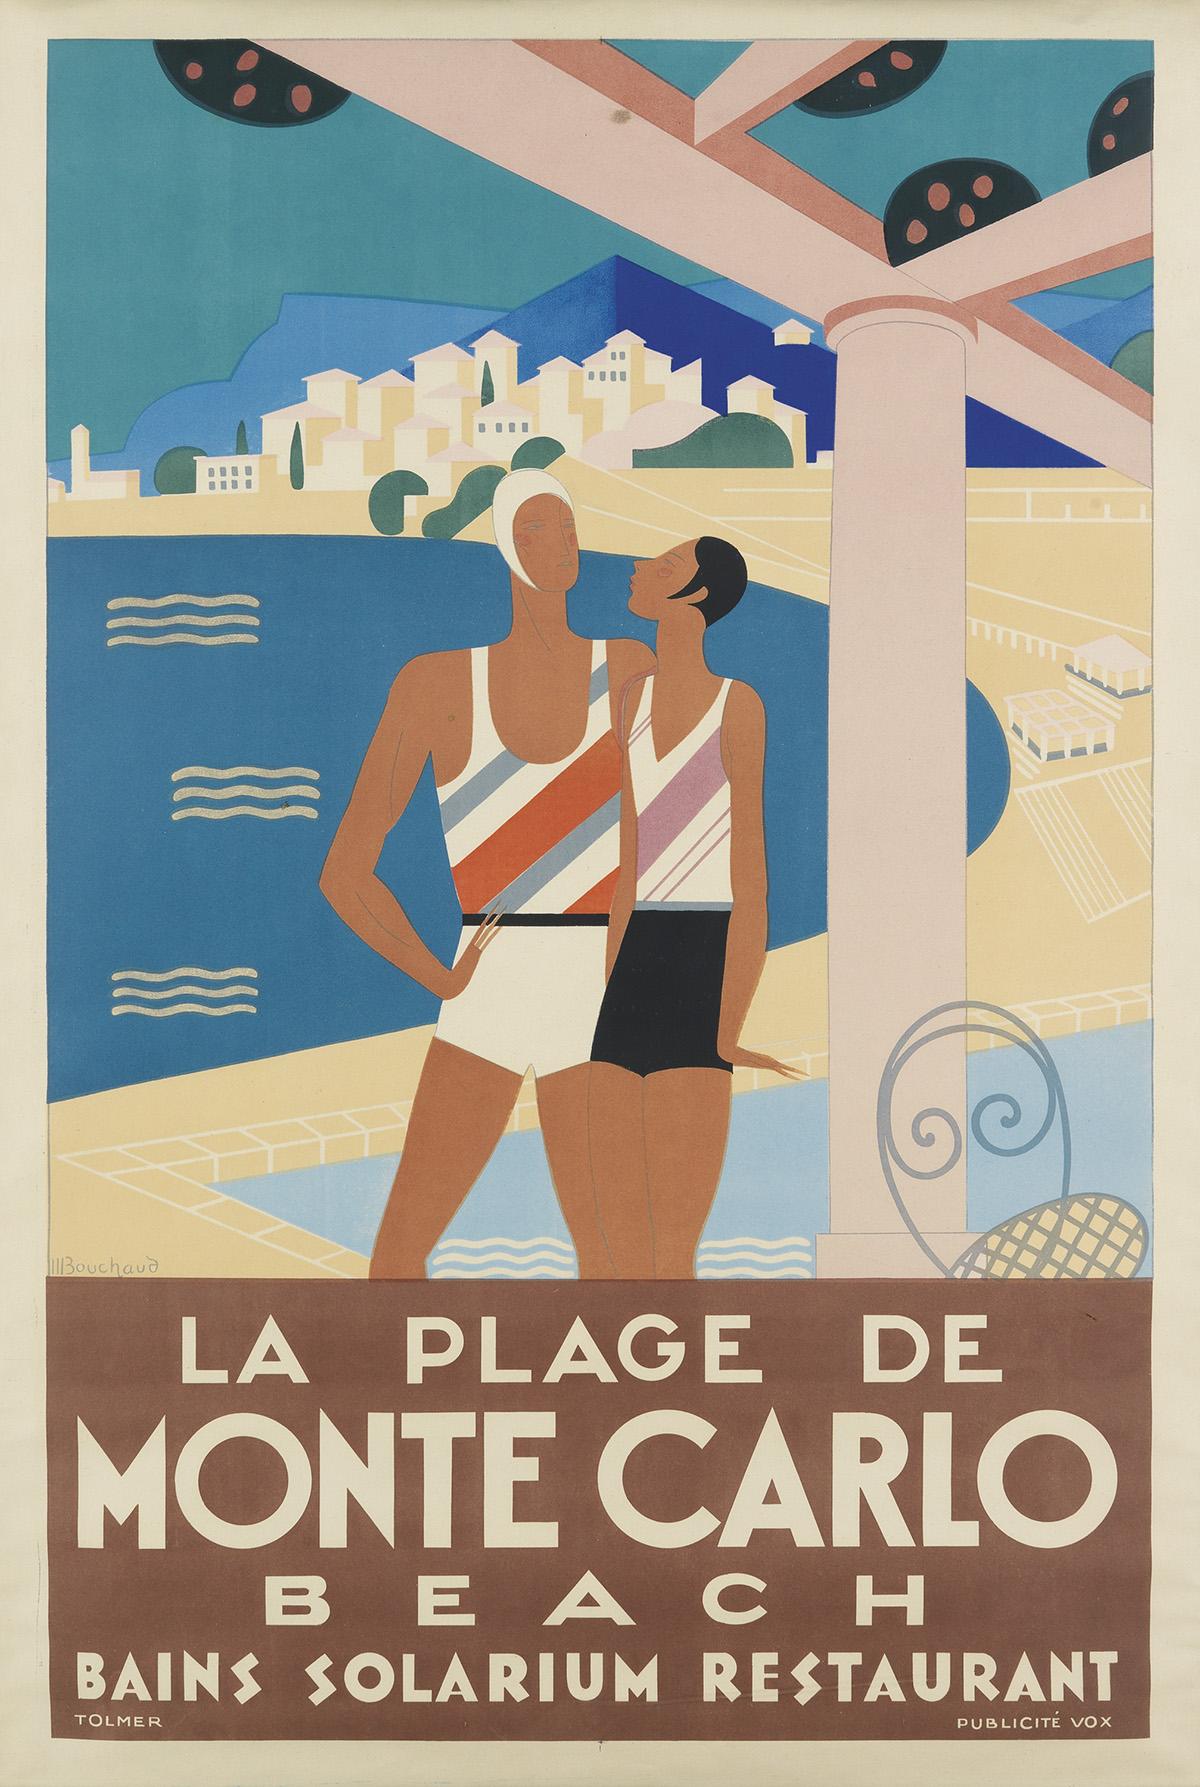 MICHEL-BOUCHAUD-(DATES-UNKNOWN)-LA-PLAGE-DE-MONTE-CARLO-1929